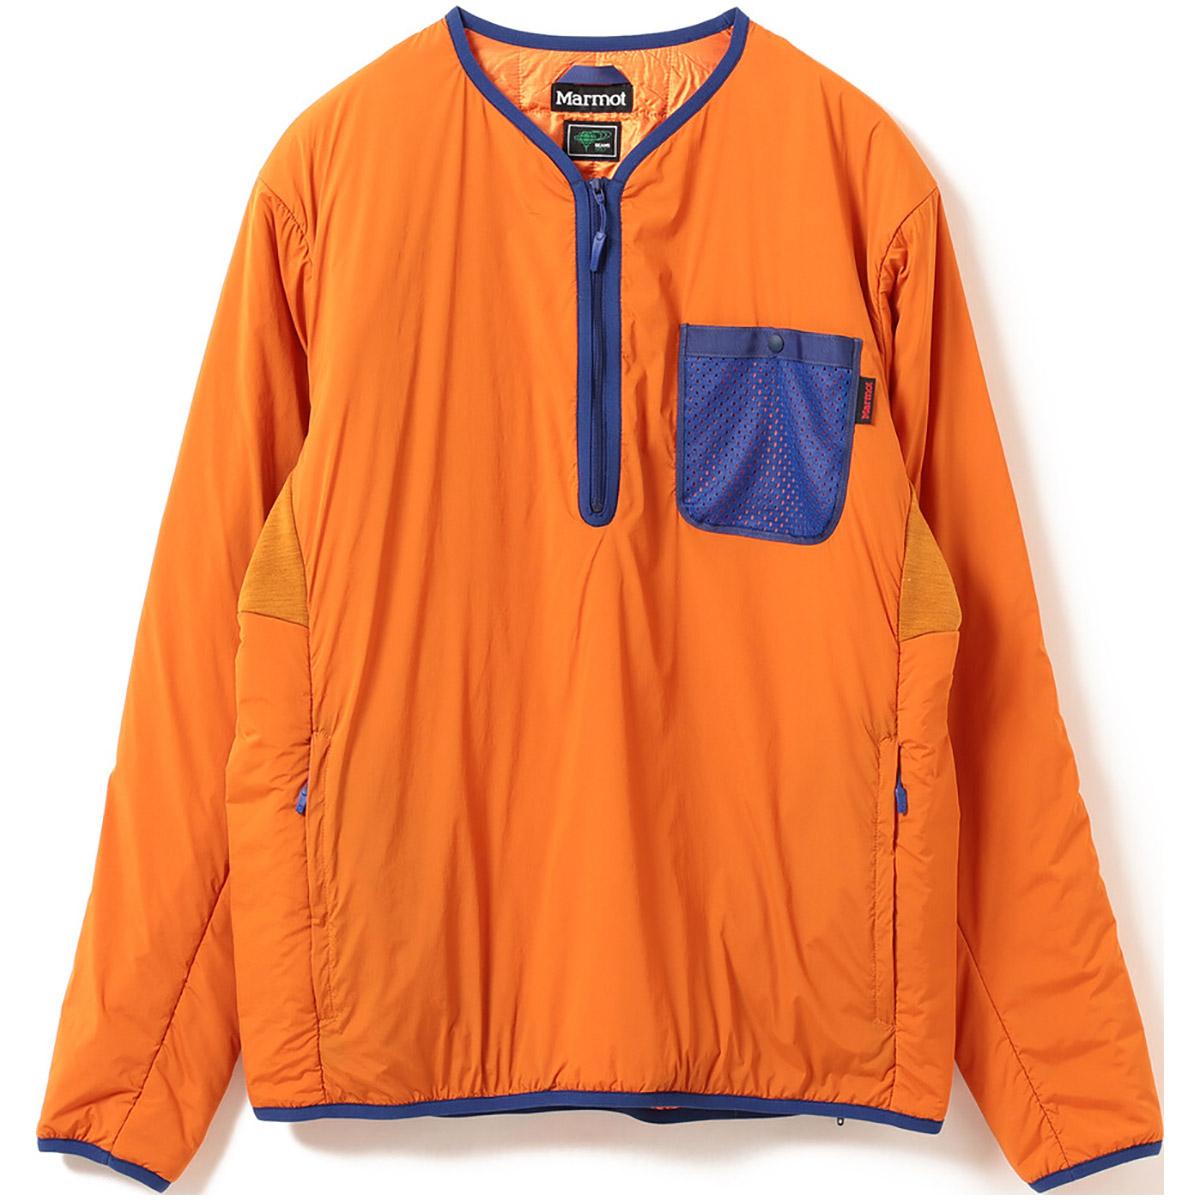 Marmot×BEAMS GOLF 別注 ウールラップ プルオーバー ジャケット